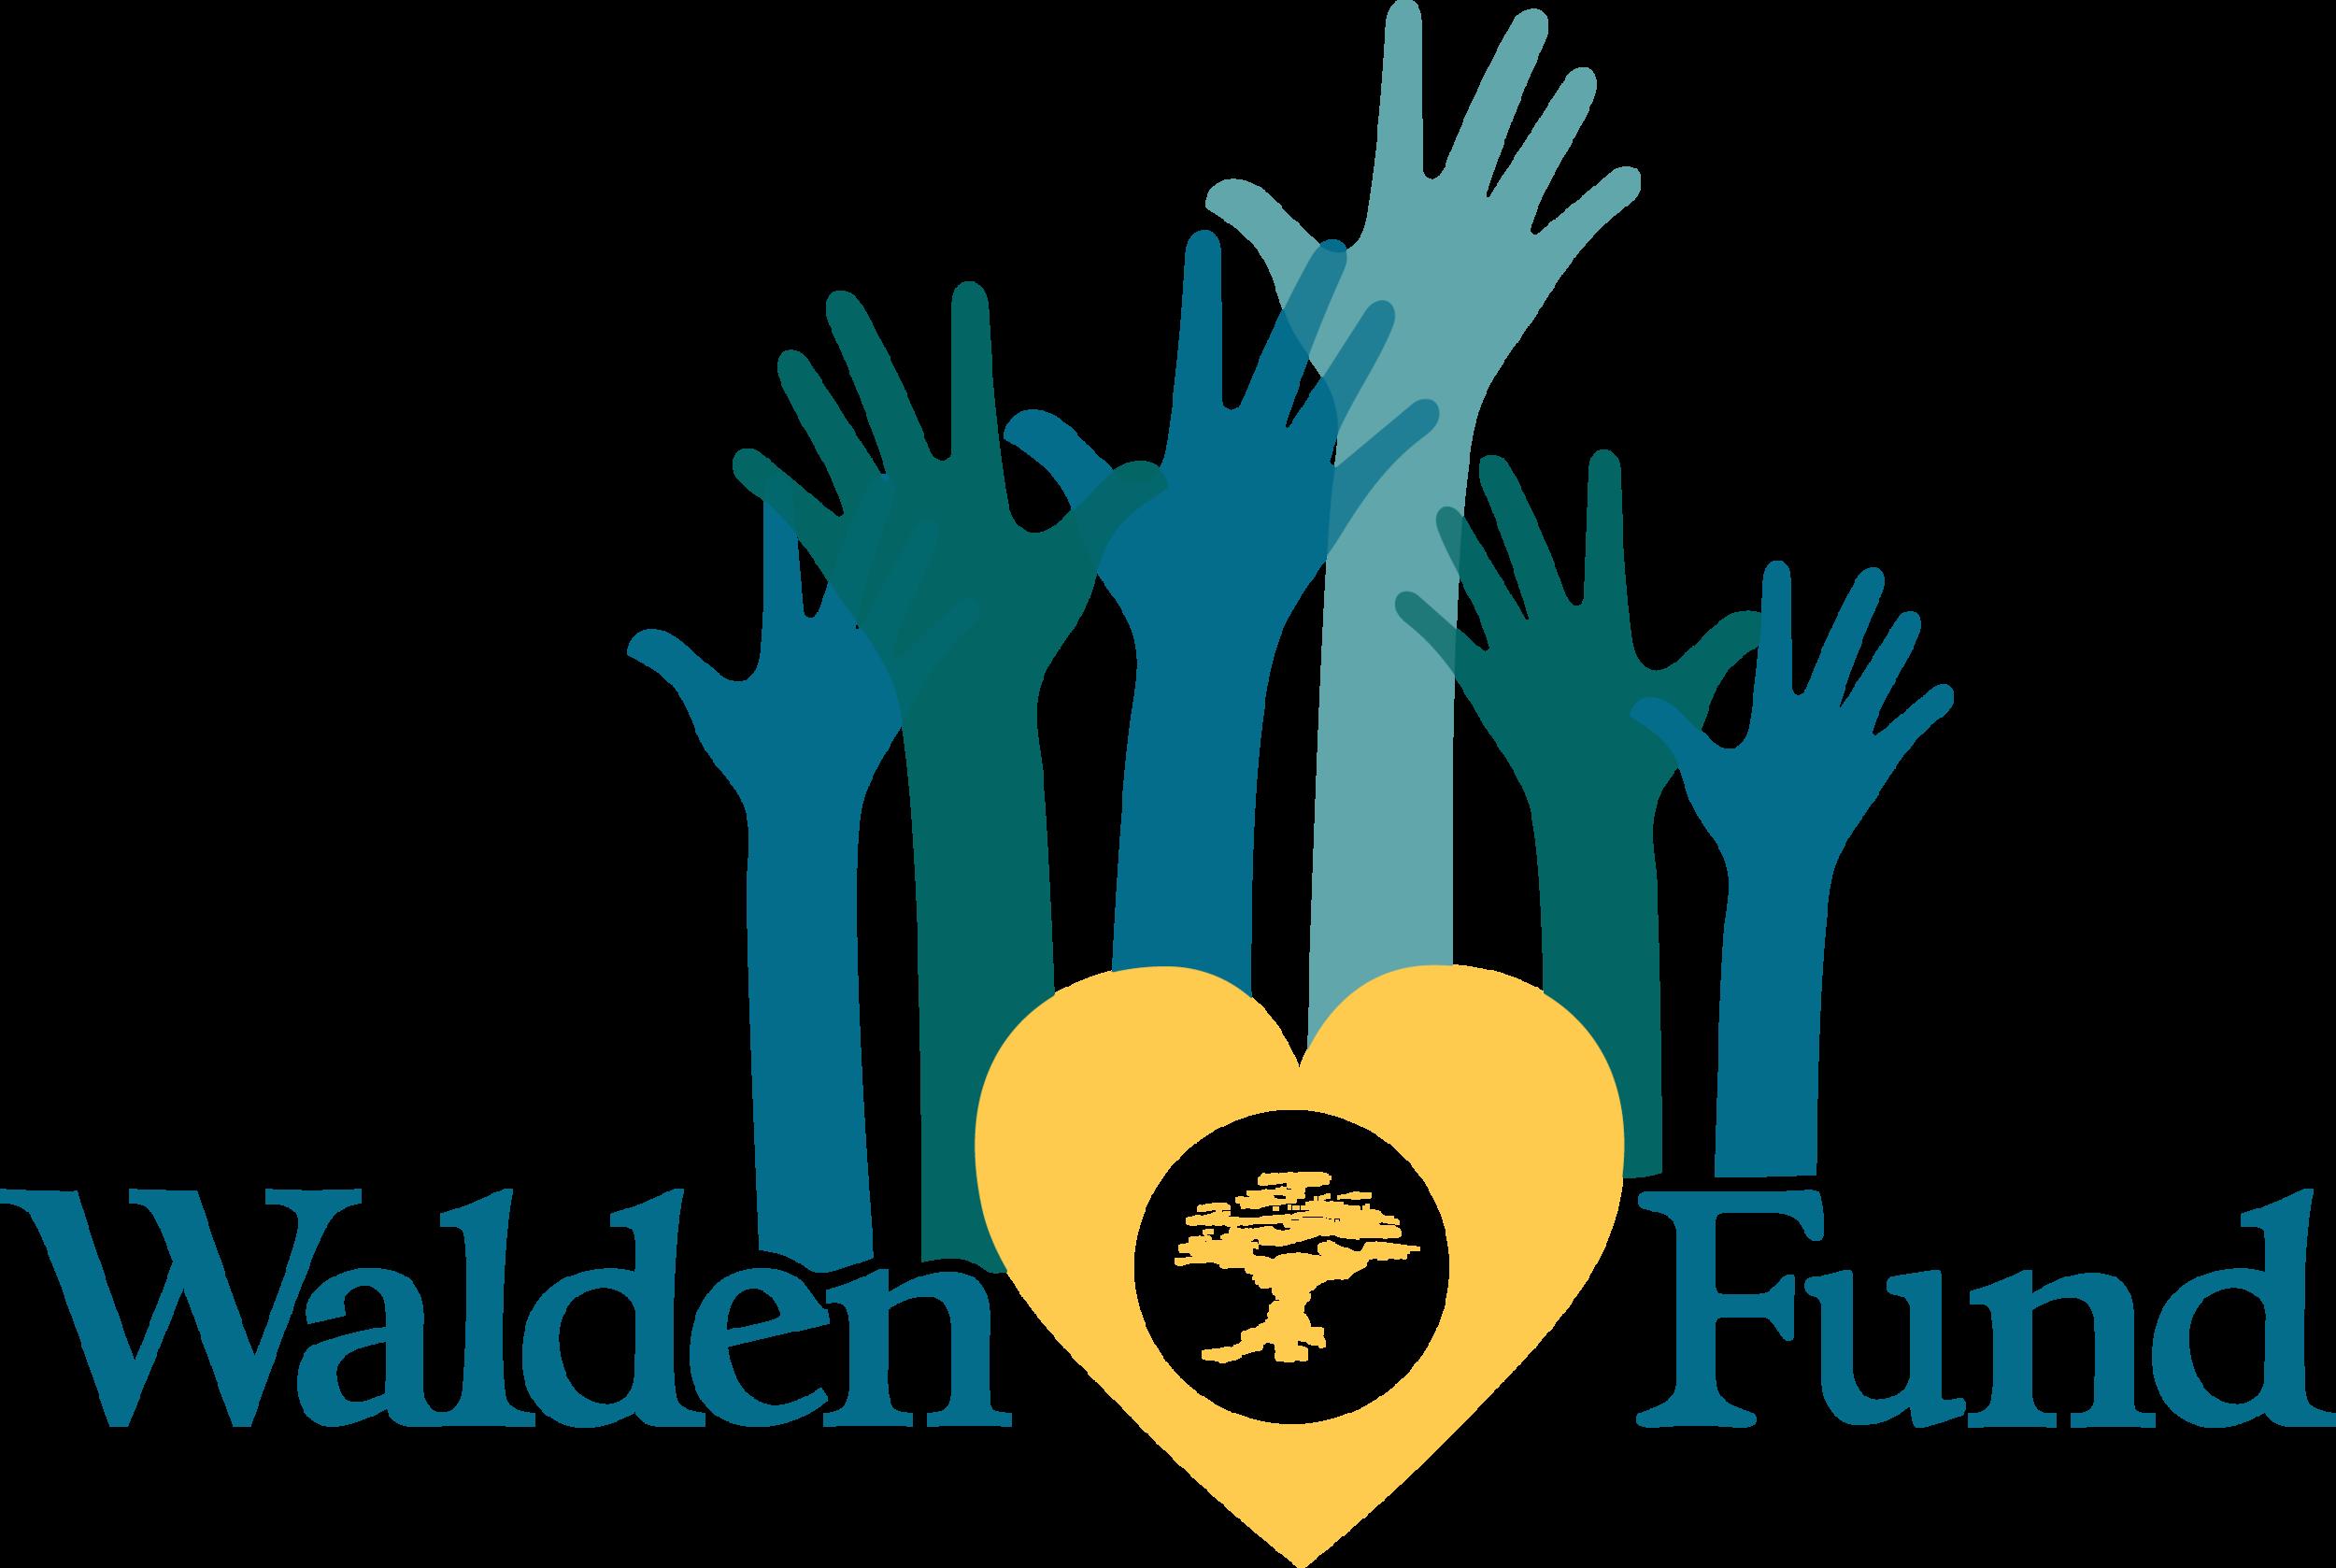 Walden Fund_2018 logo-01.png